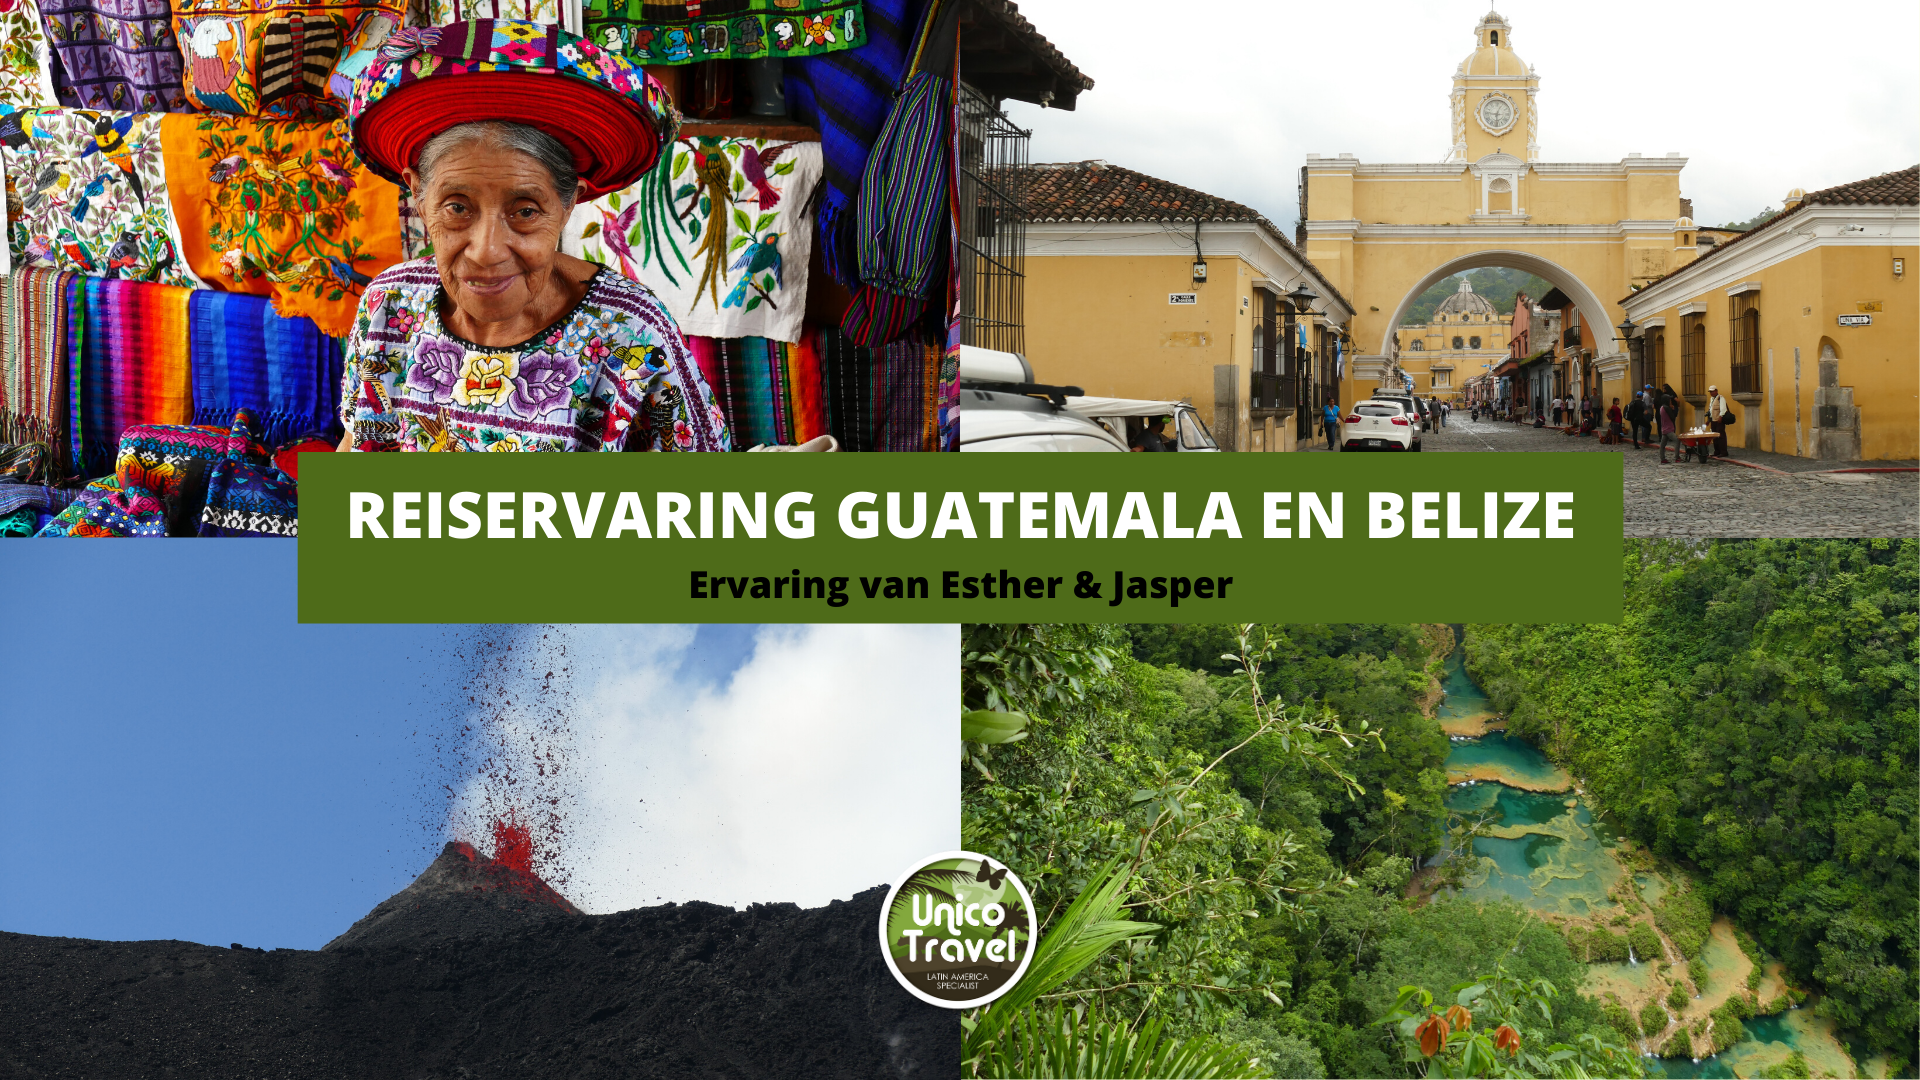 Reiservaring Guatemala en Belize